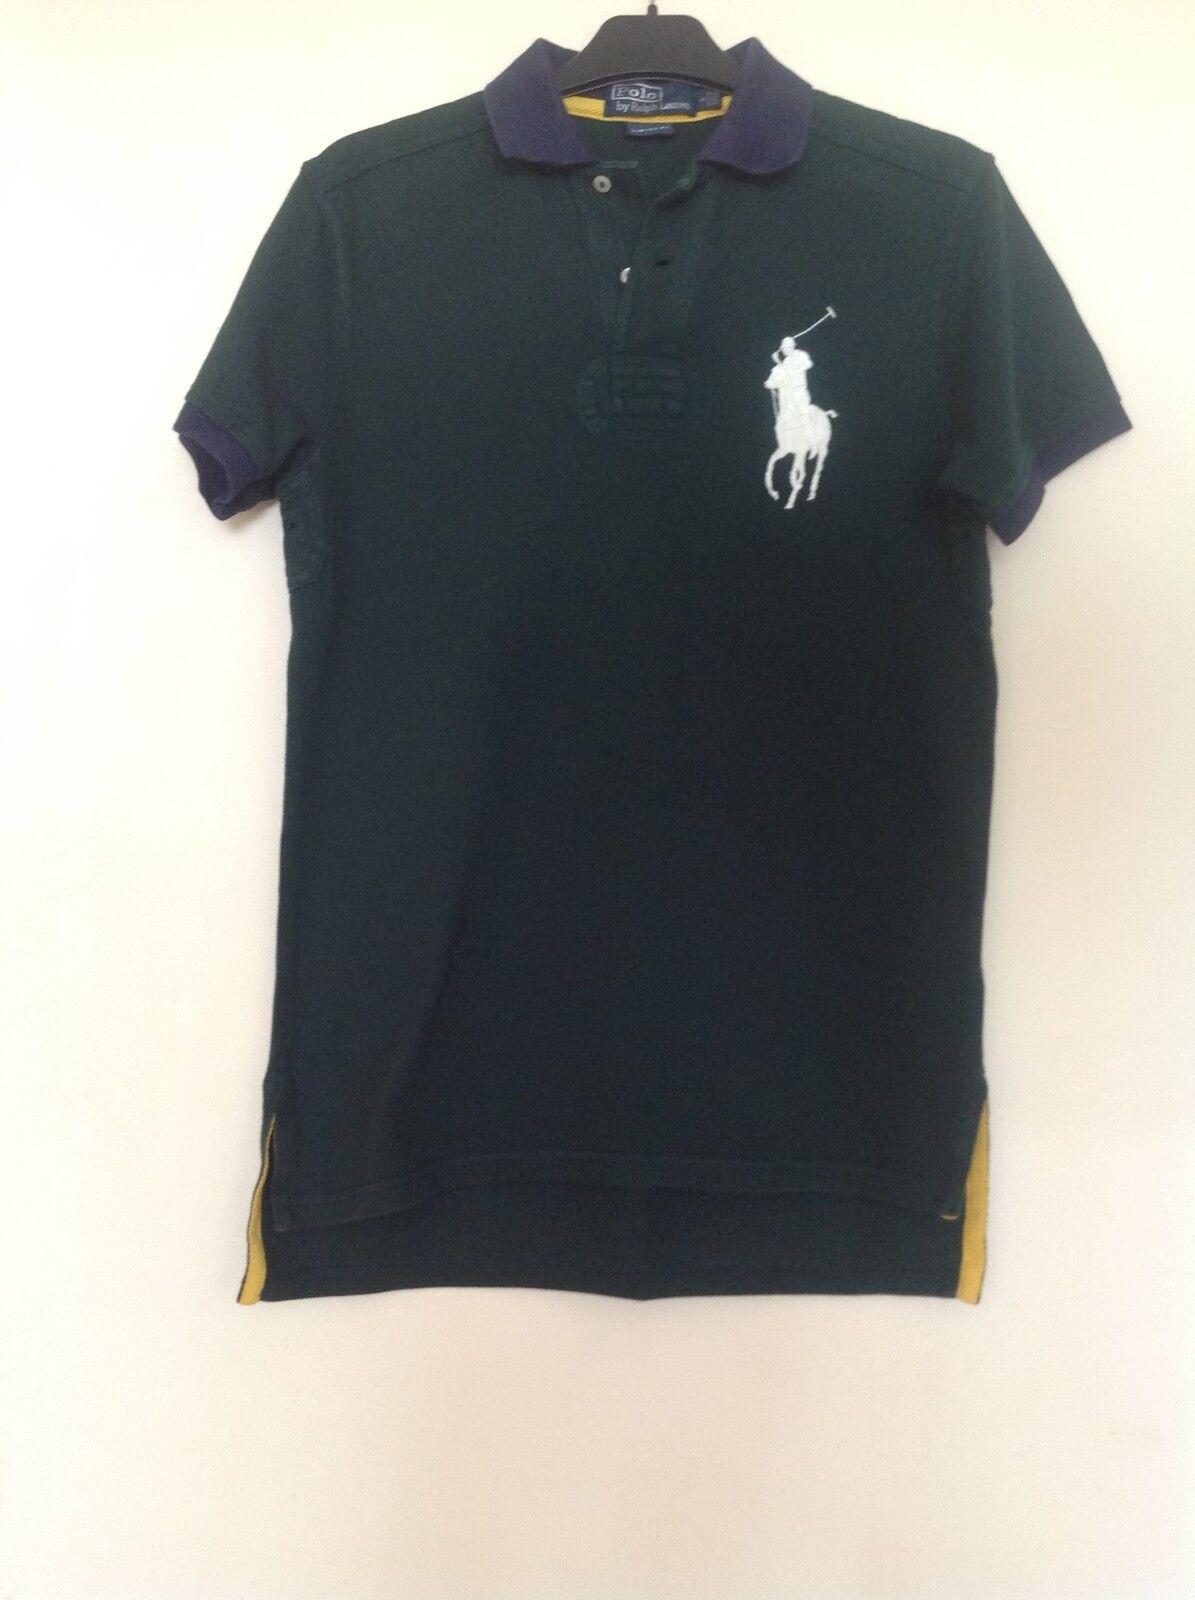 Ralph Lauren Men's dark green Polo Shirt size s. Authentic